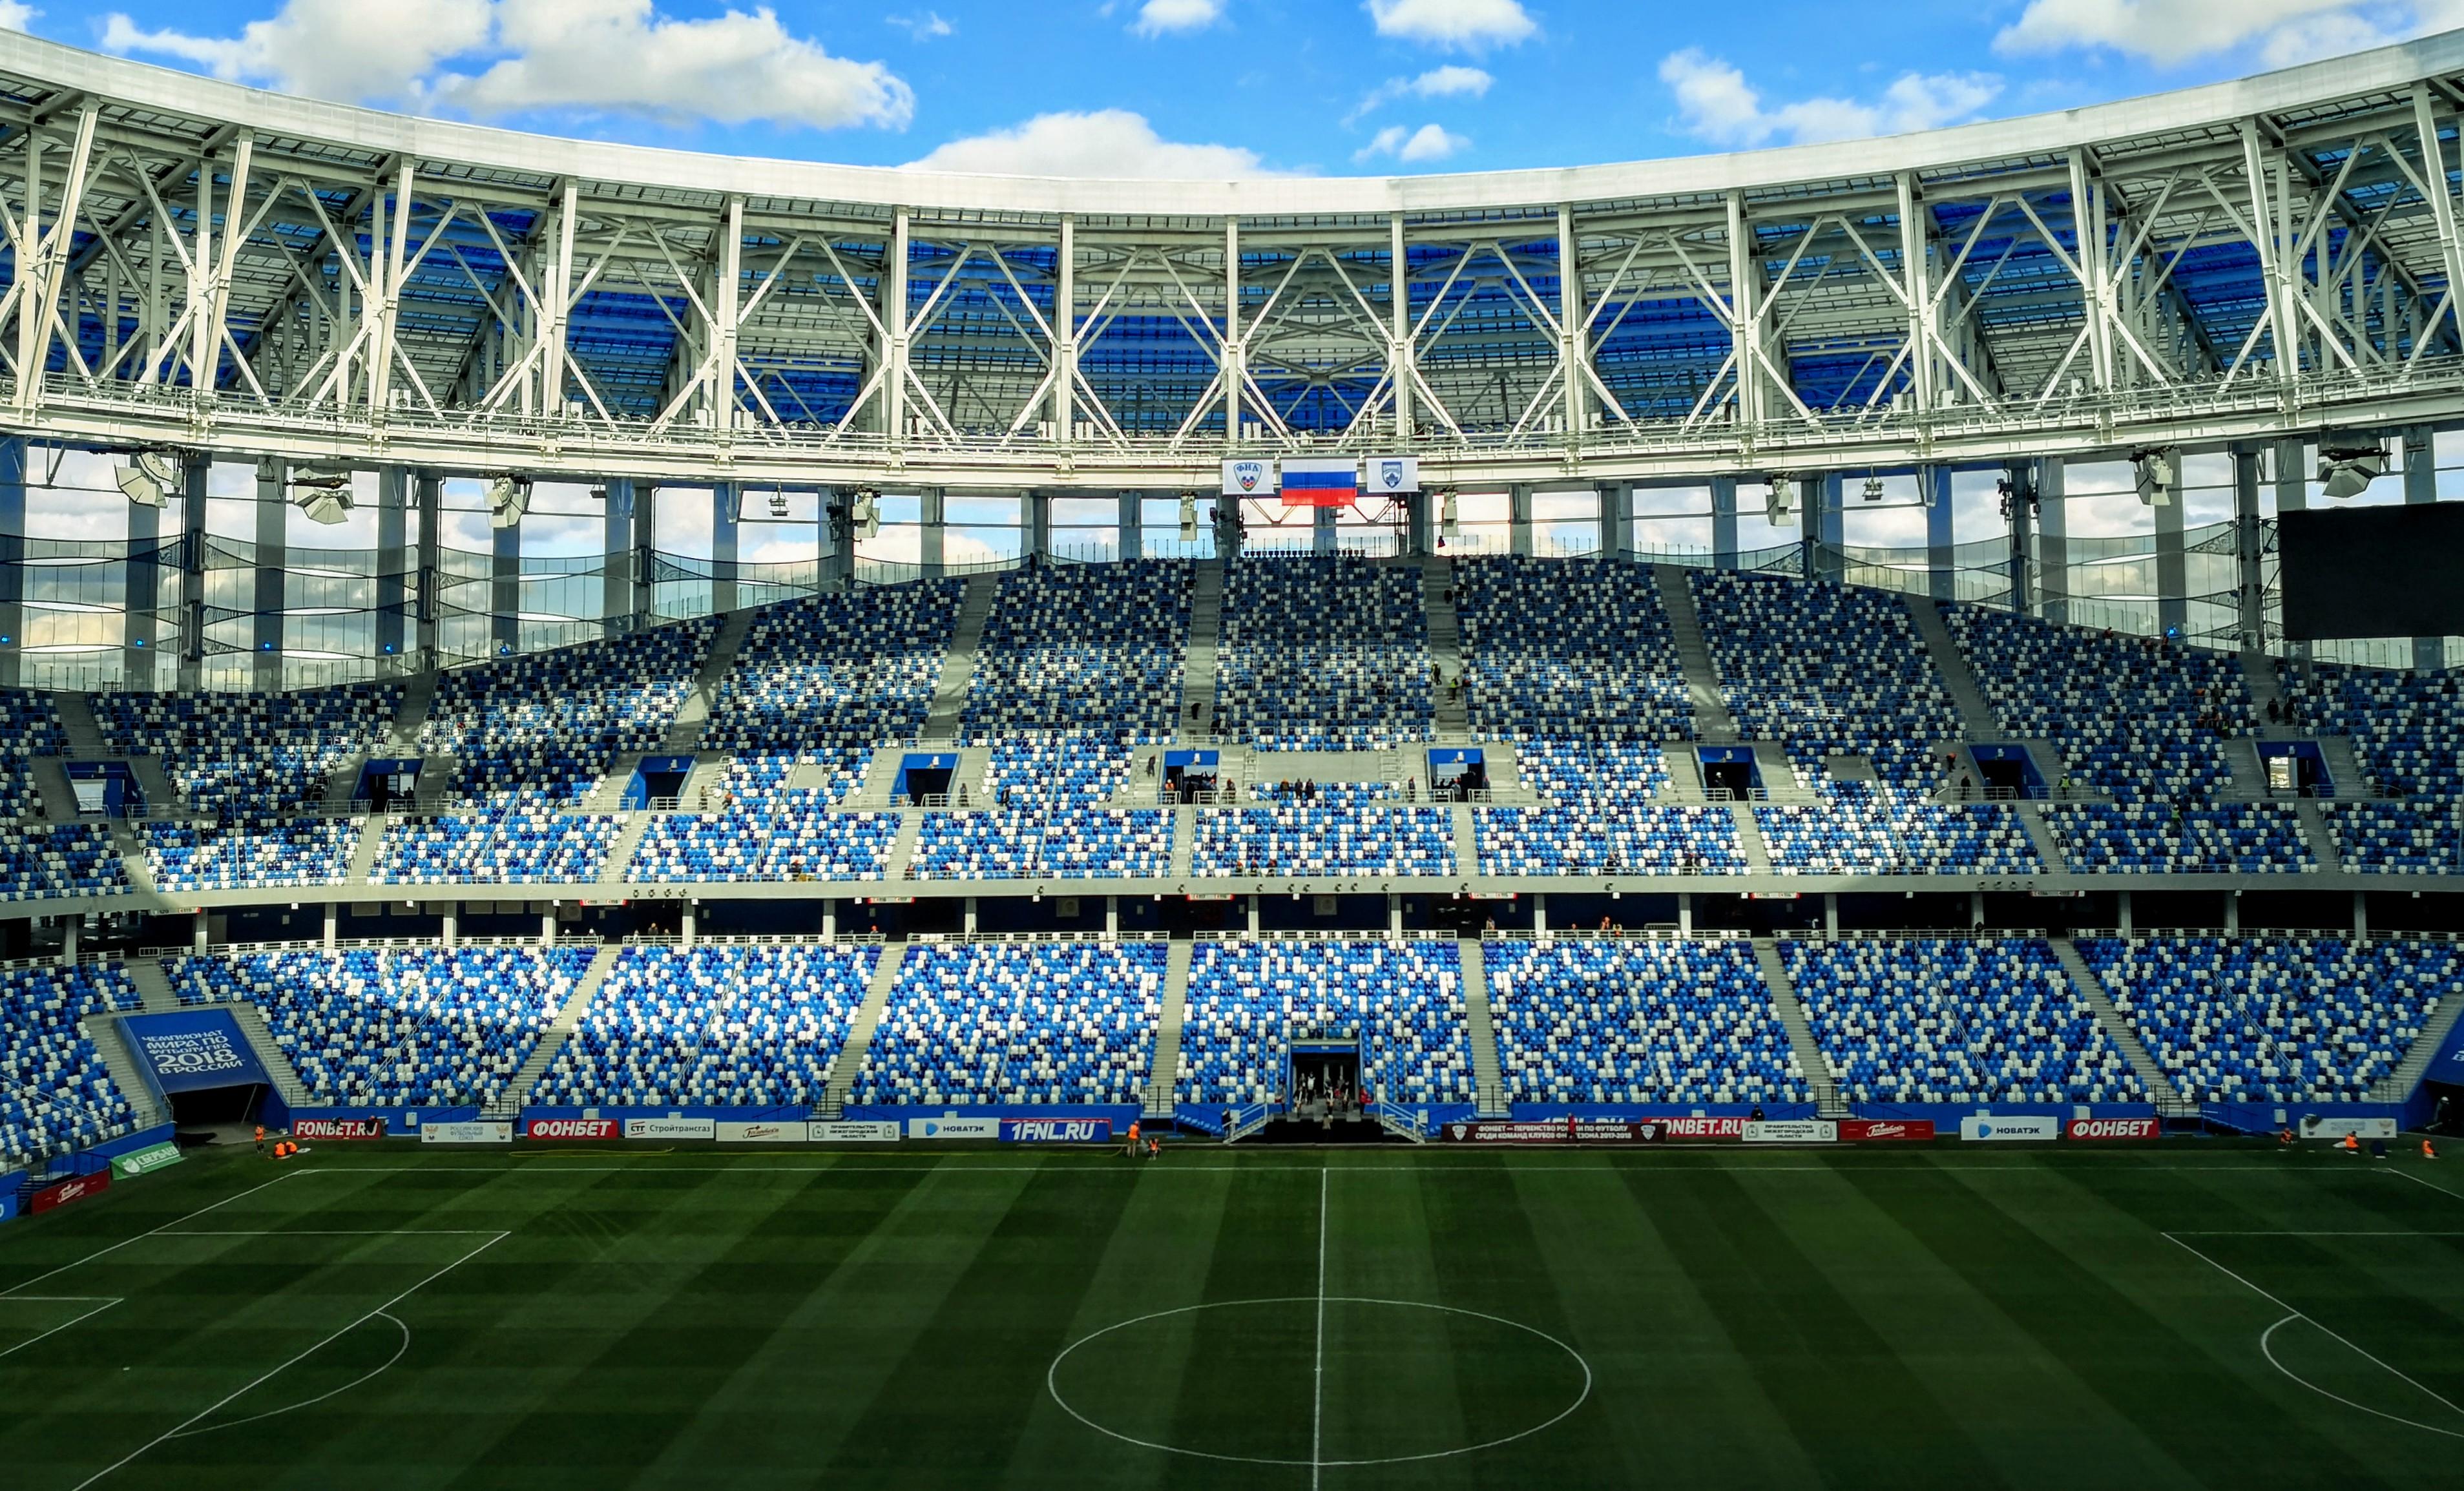 Чаша стадион, вид с верхних трибун центрального сектора